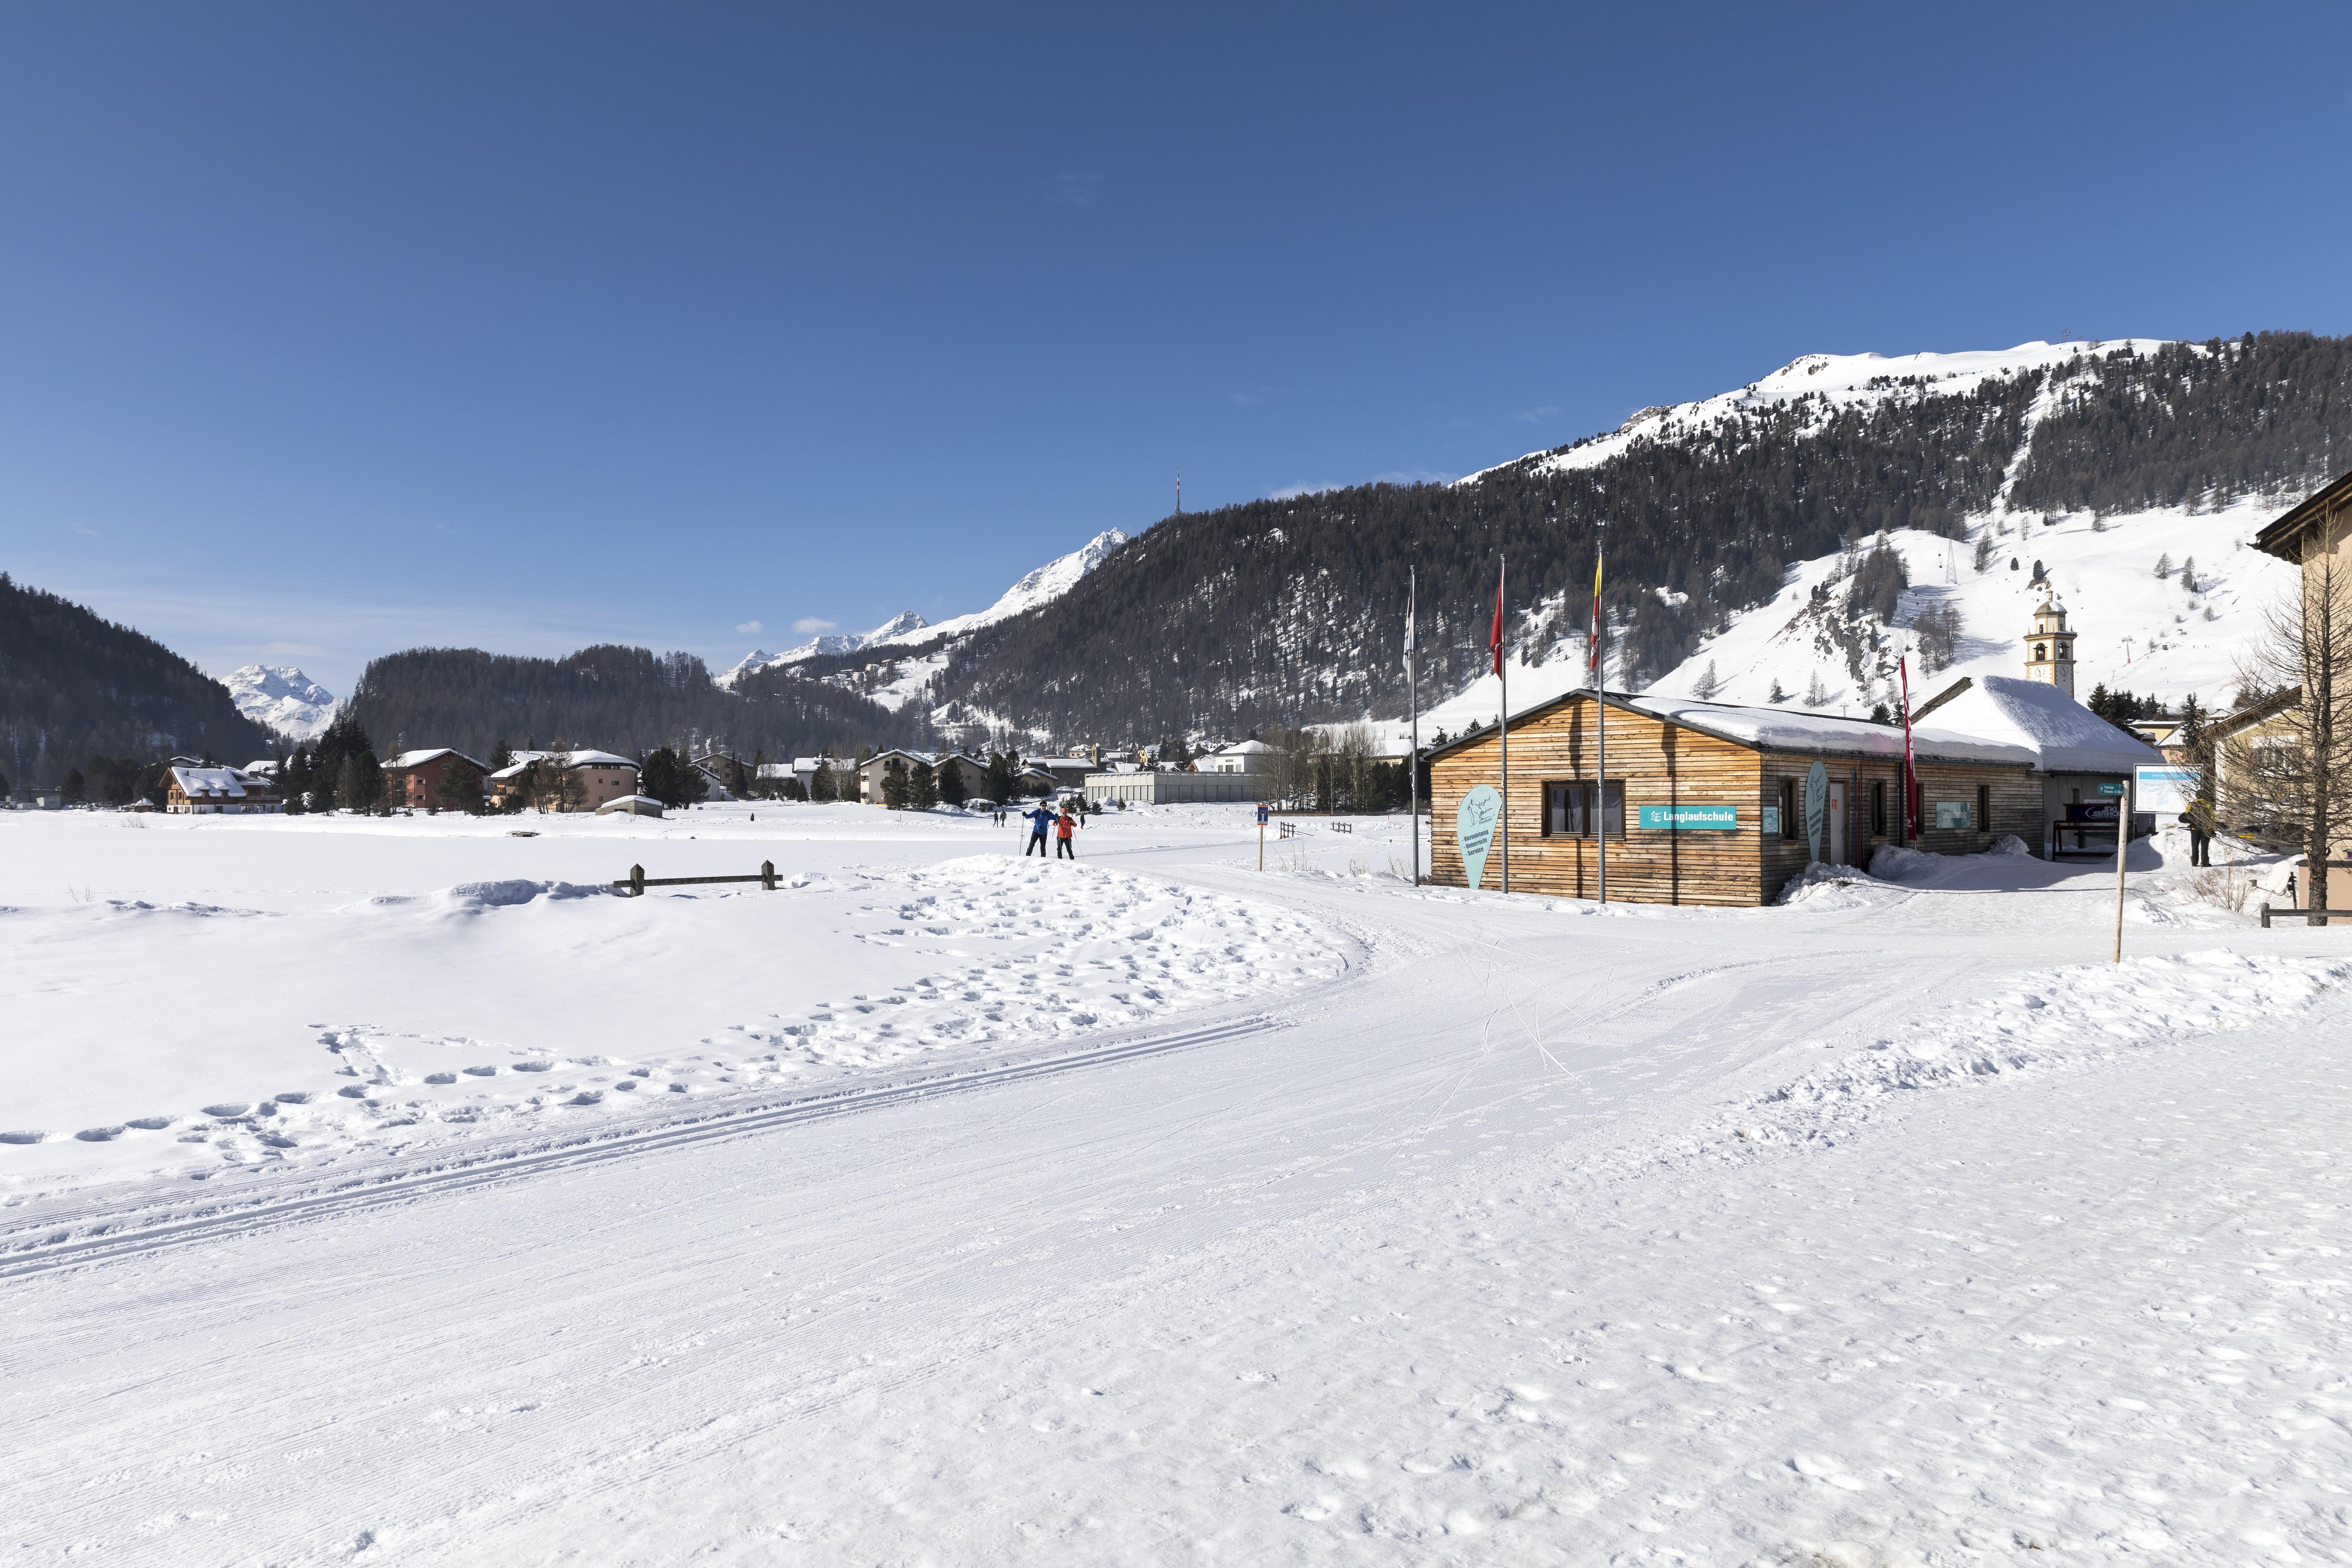 Cross-country ski schools